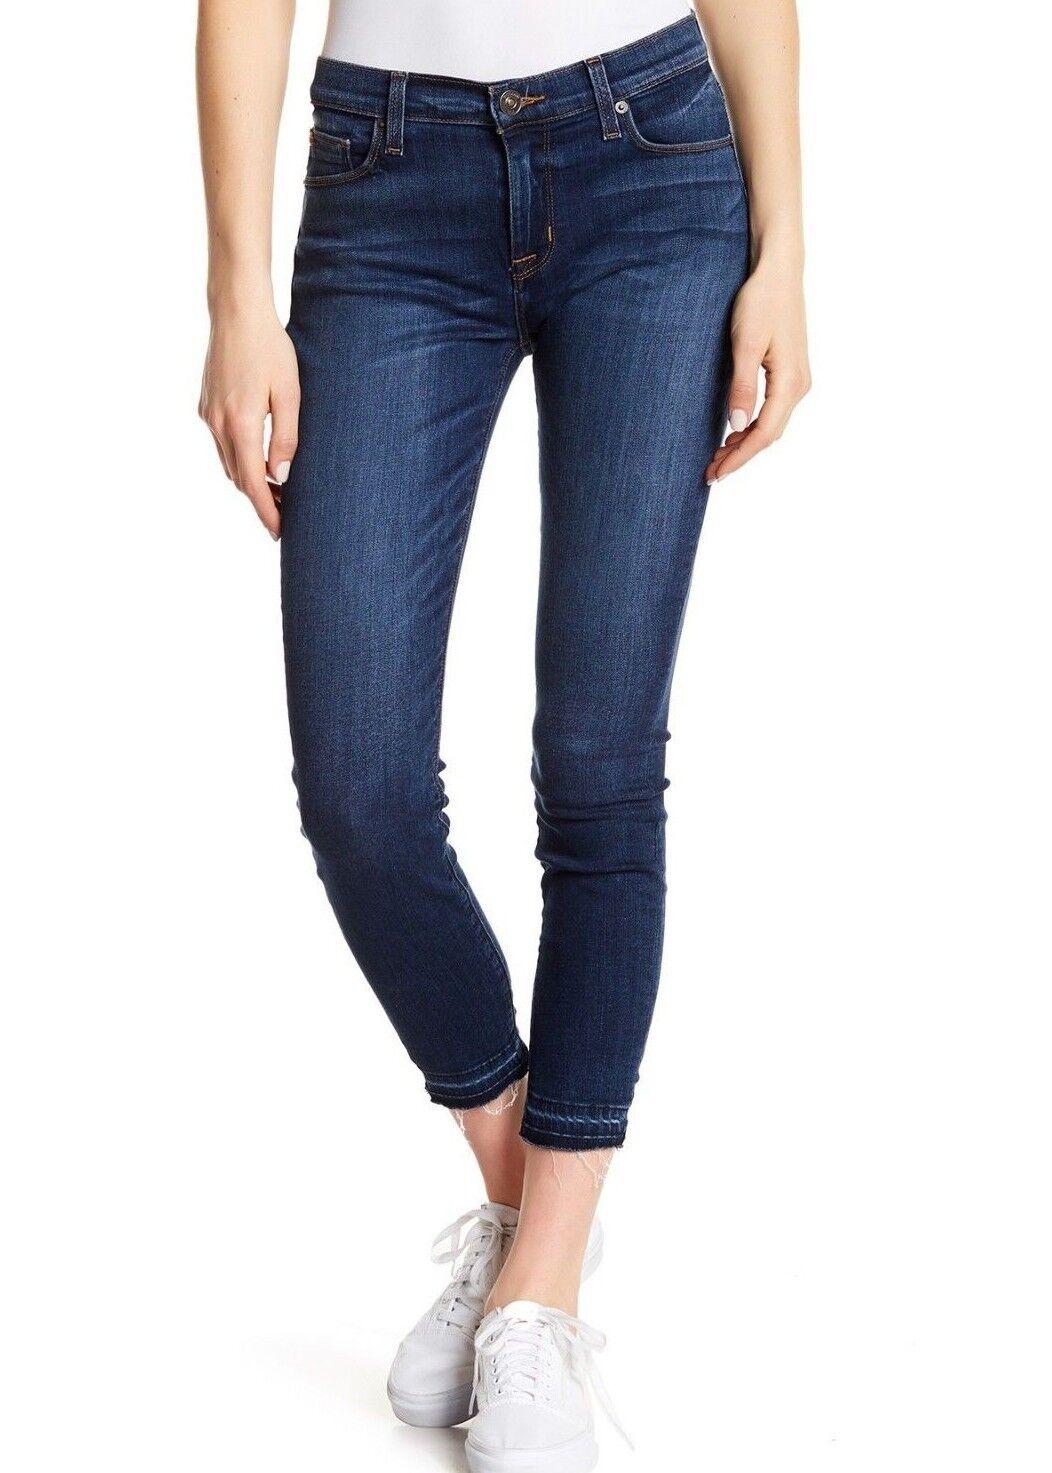 Nwt Hudson Sz27 Natalie Midrise Roh Knöchel Skinny-Stretch Jeans Gratitude